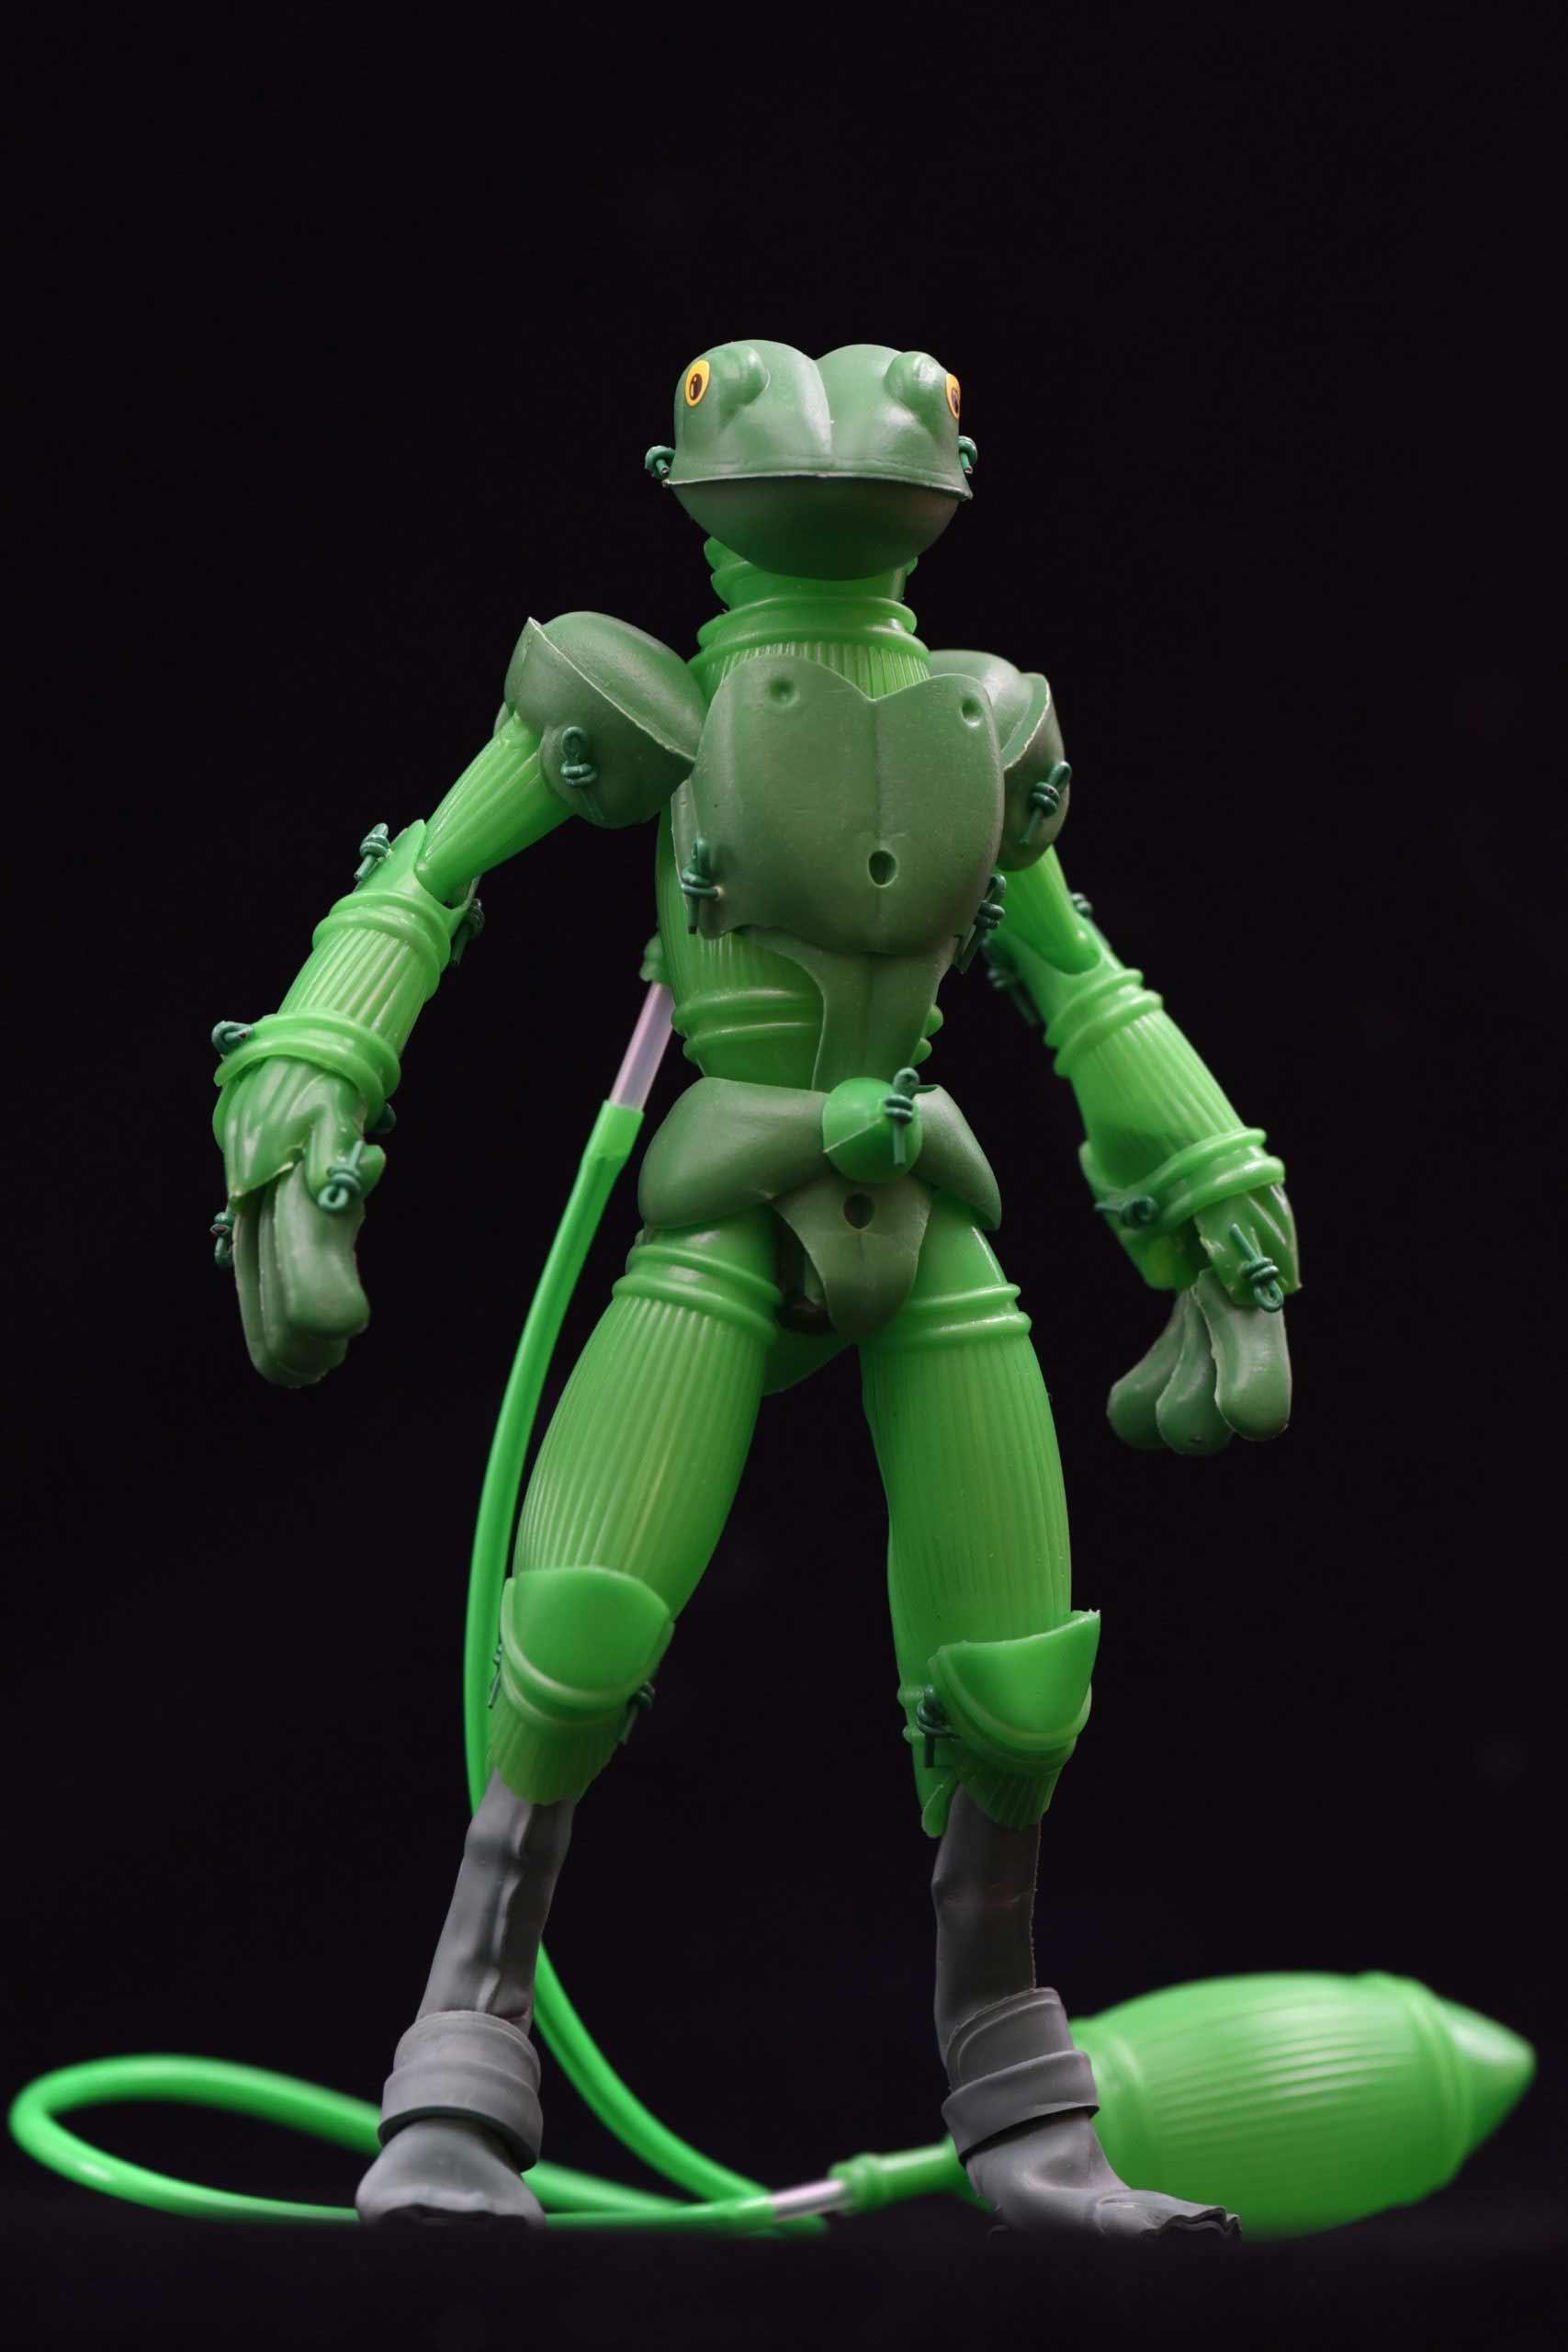 Quietscheentchen-Actionfigur quietscheentchen-actionfiguren-Tomohiro-Yasui_07